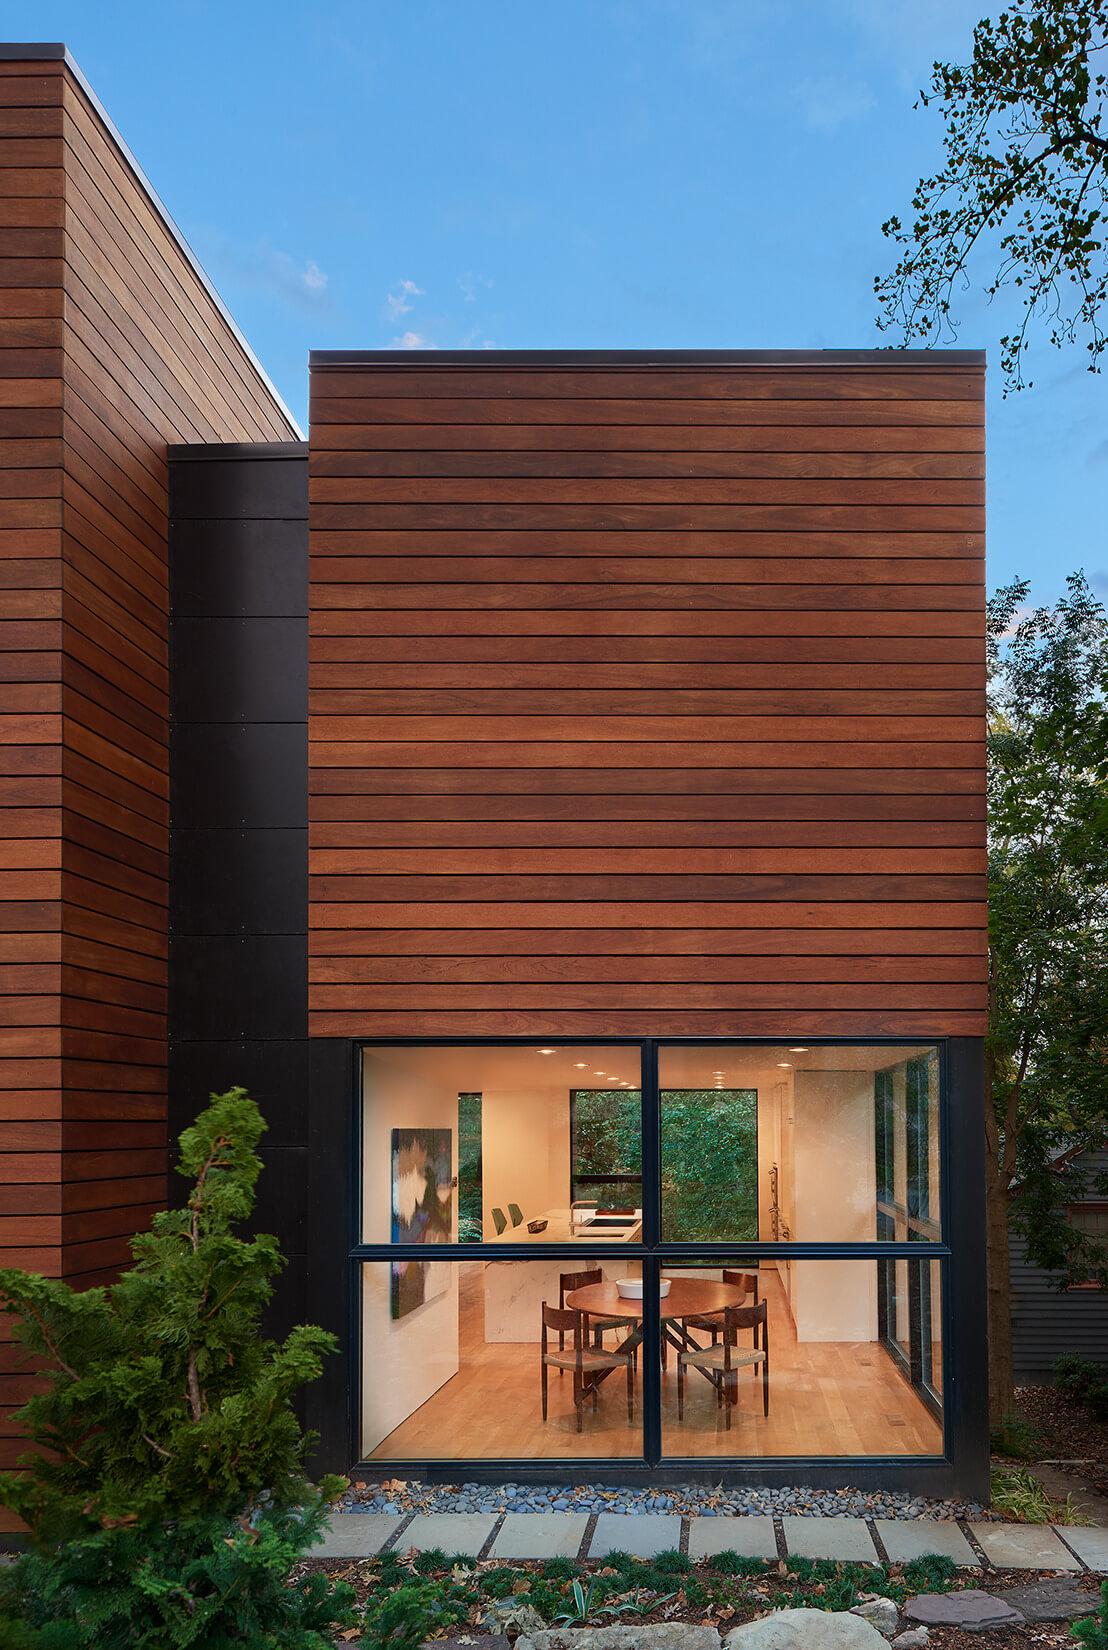 Lyon Park House by Robert M. Gurney